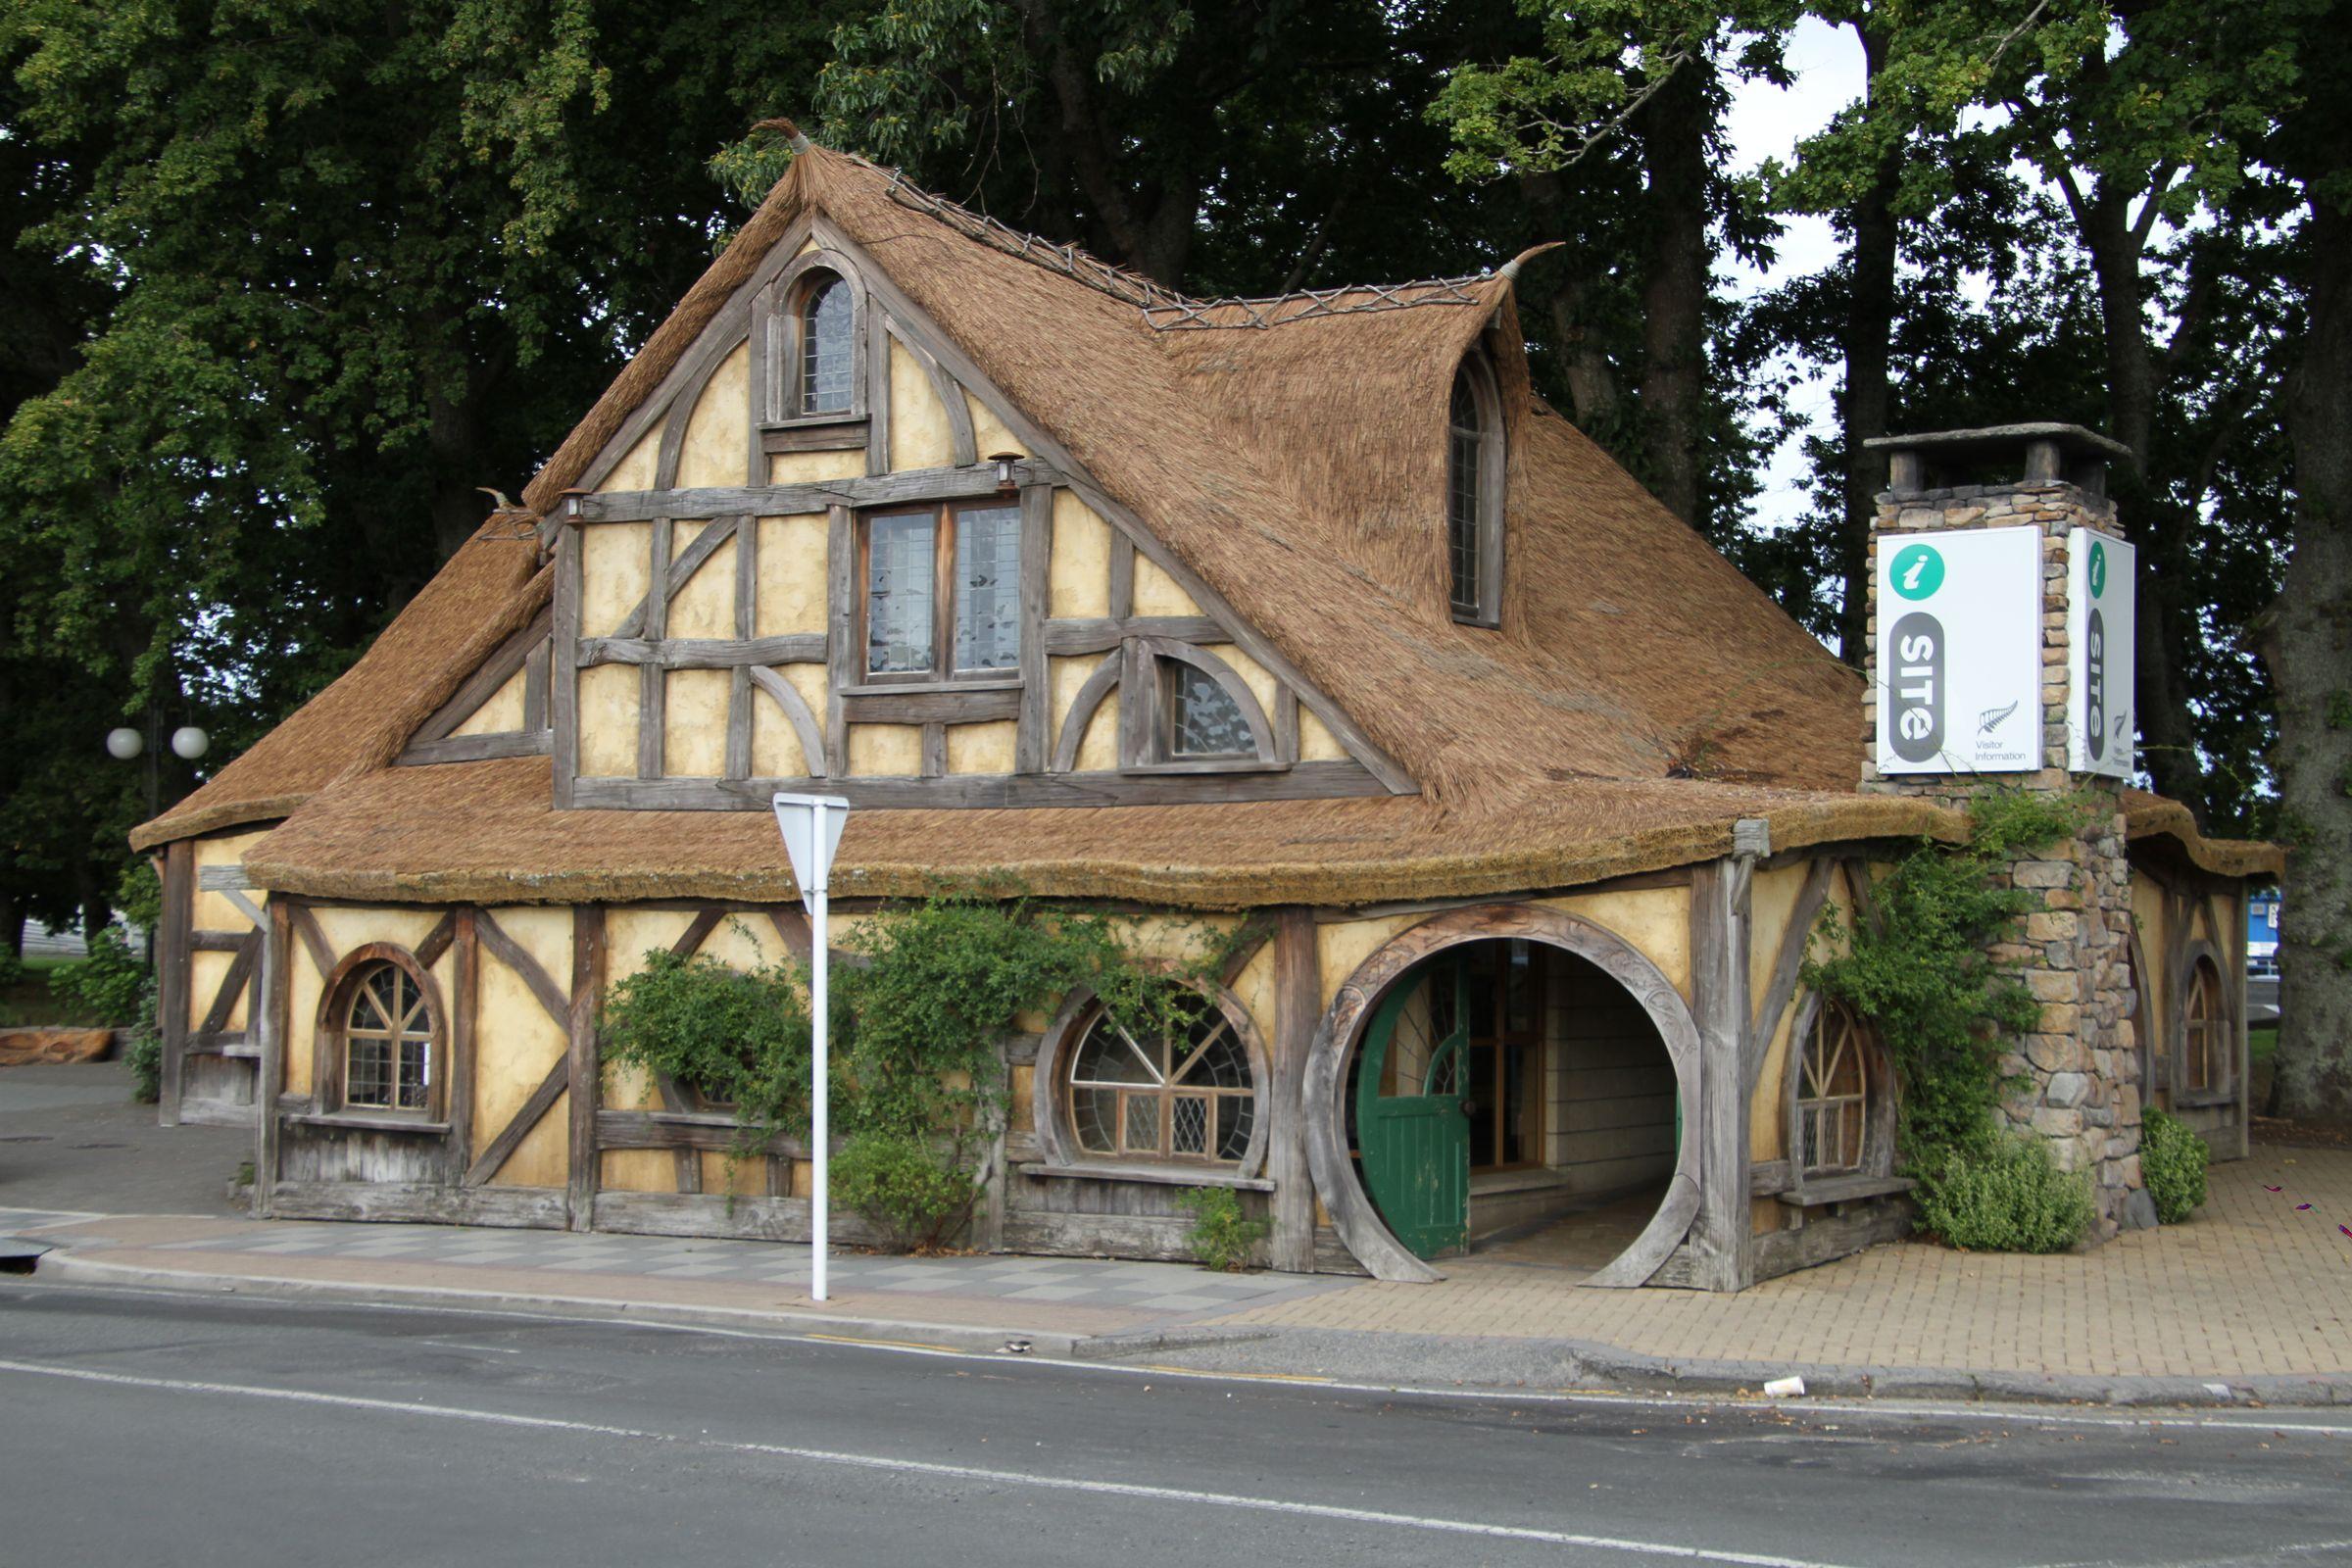 https://bubo.sk/uploads/galleries/5027/marekmeluch_novyzeland_hobbiton-visitor-centre-matamata_vysledok.jpg